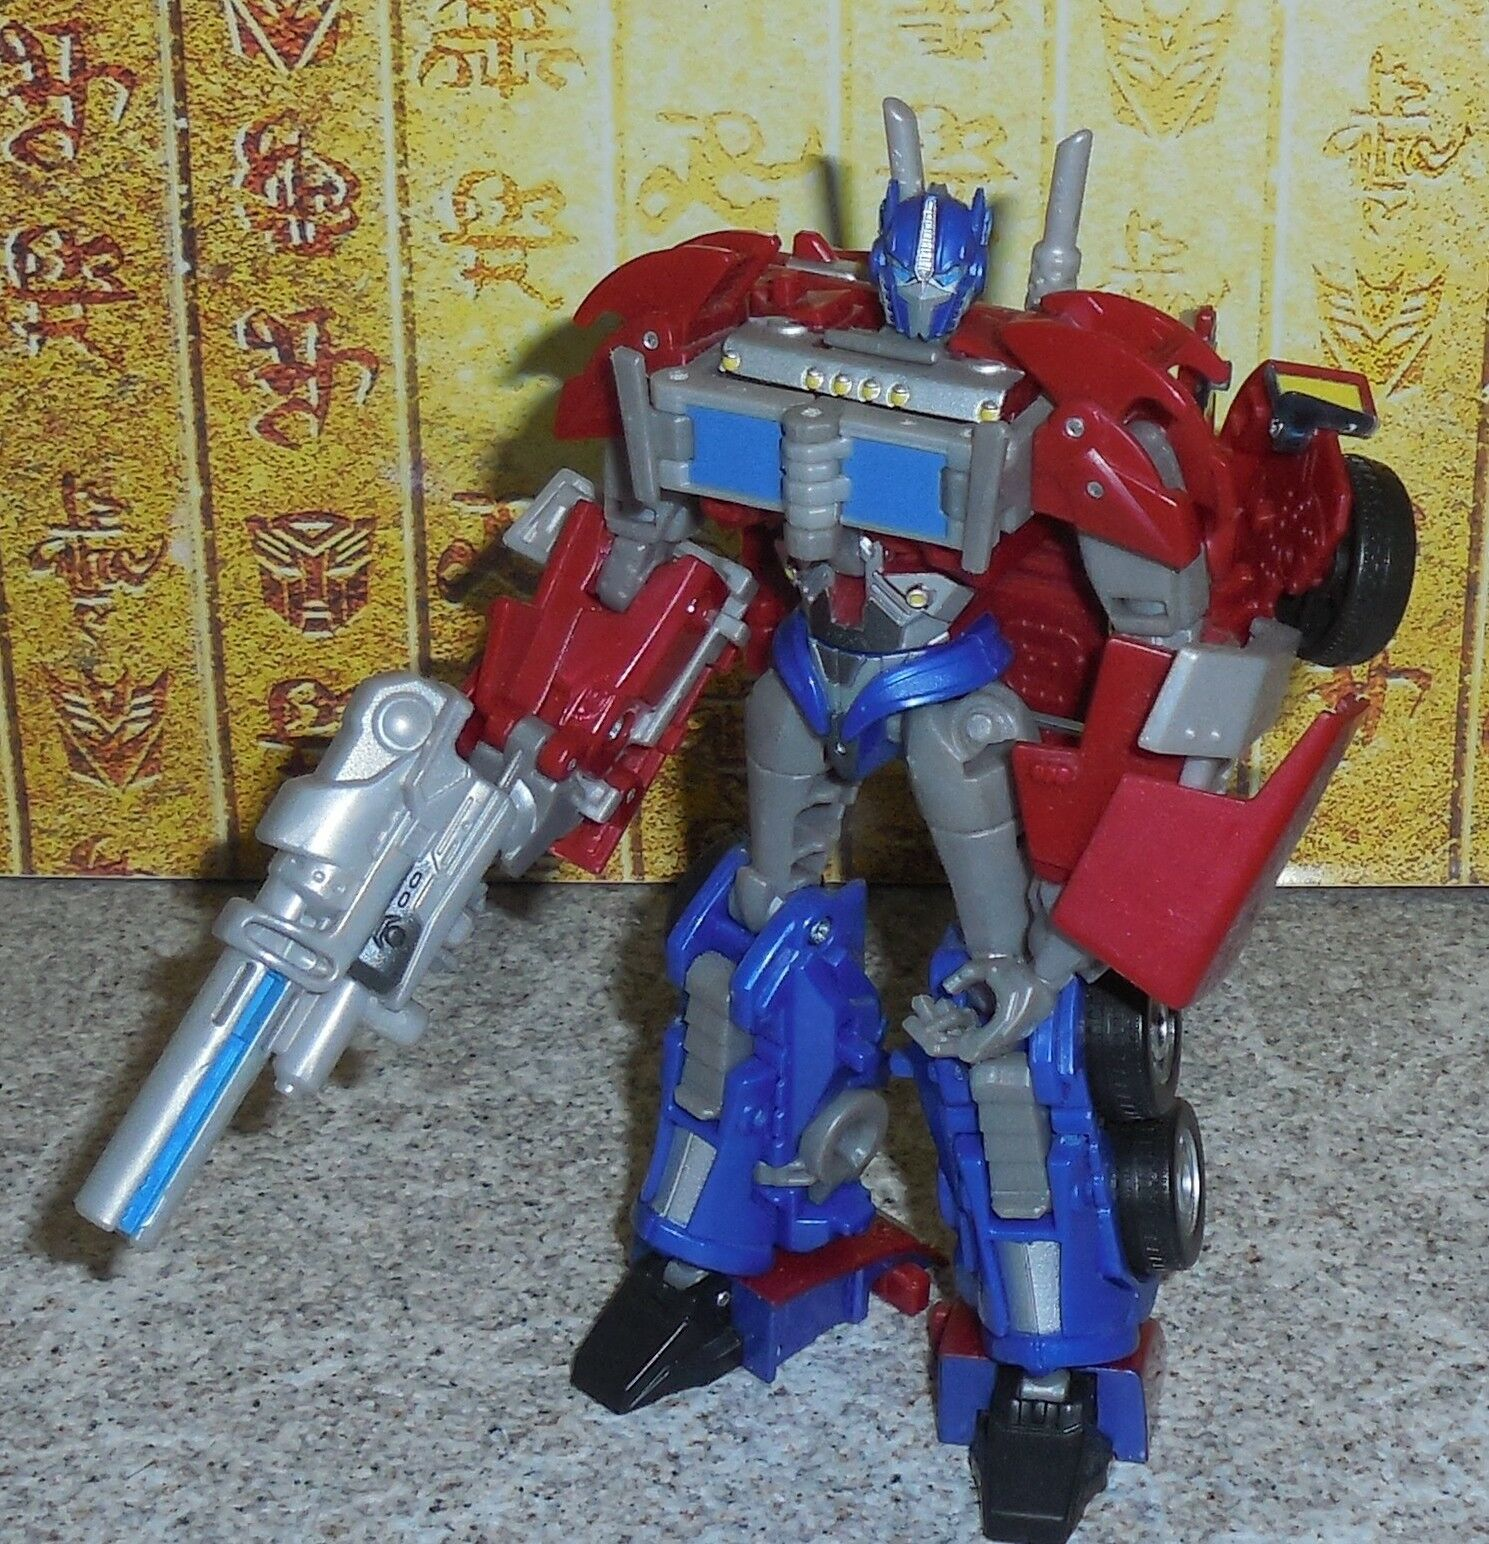 Transformers Prime Erste Ausgabe Optimus Prime Komplett Deluxe